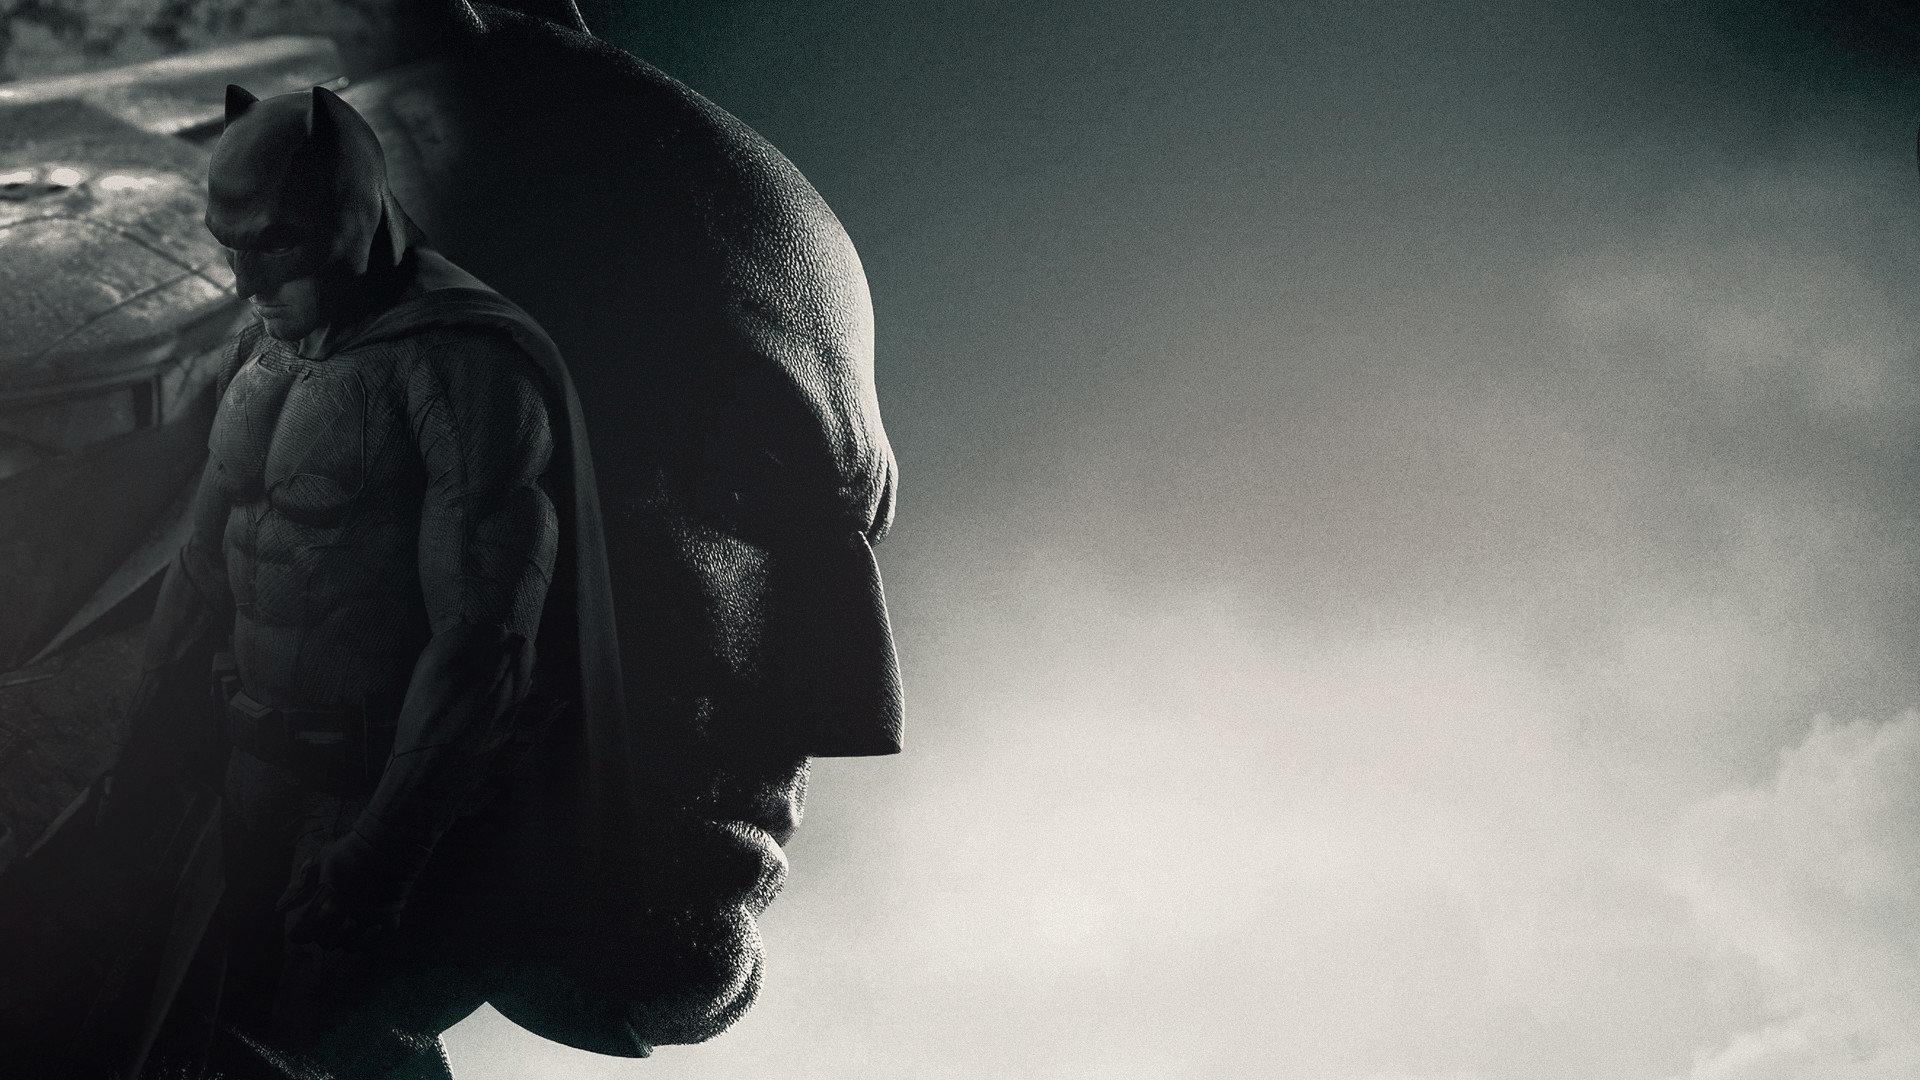 Batman V Superman Dawn Of Justice Wallpapers 1920x1080 Full Hd